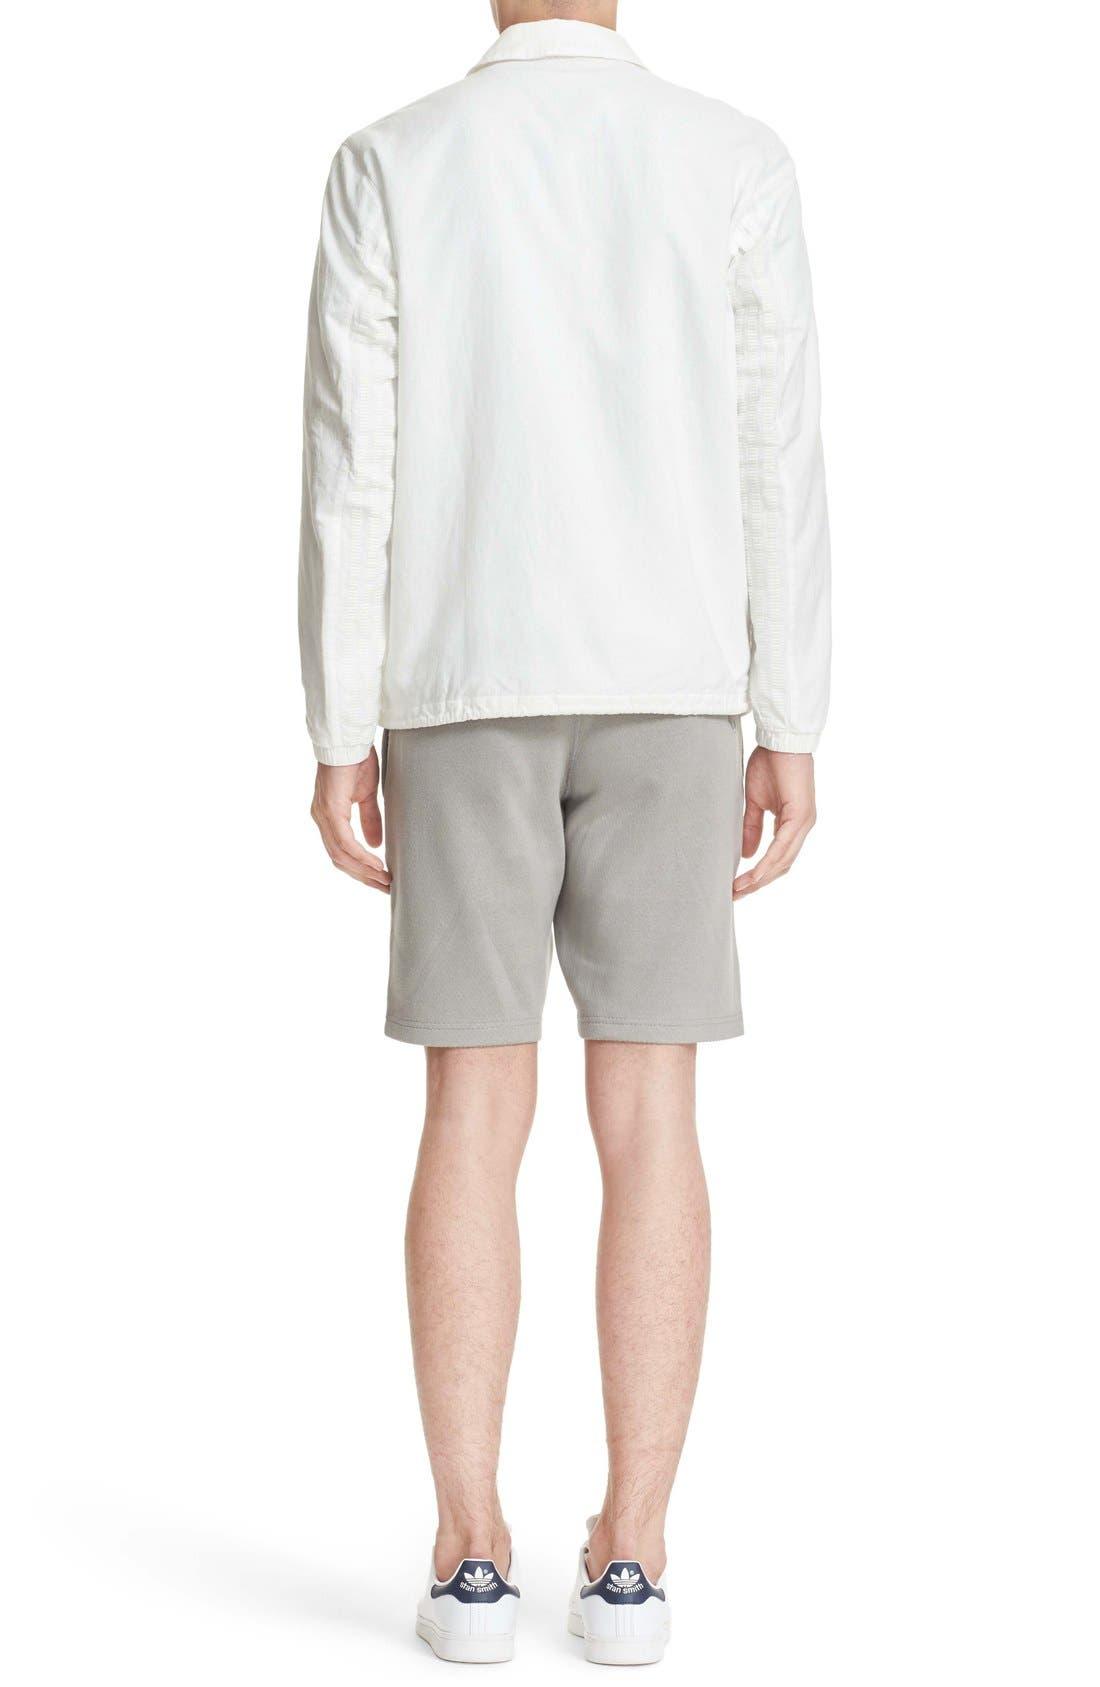 Bonded Jersey Shorts,                             Alternate thumbnail 2, color,                             020